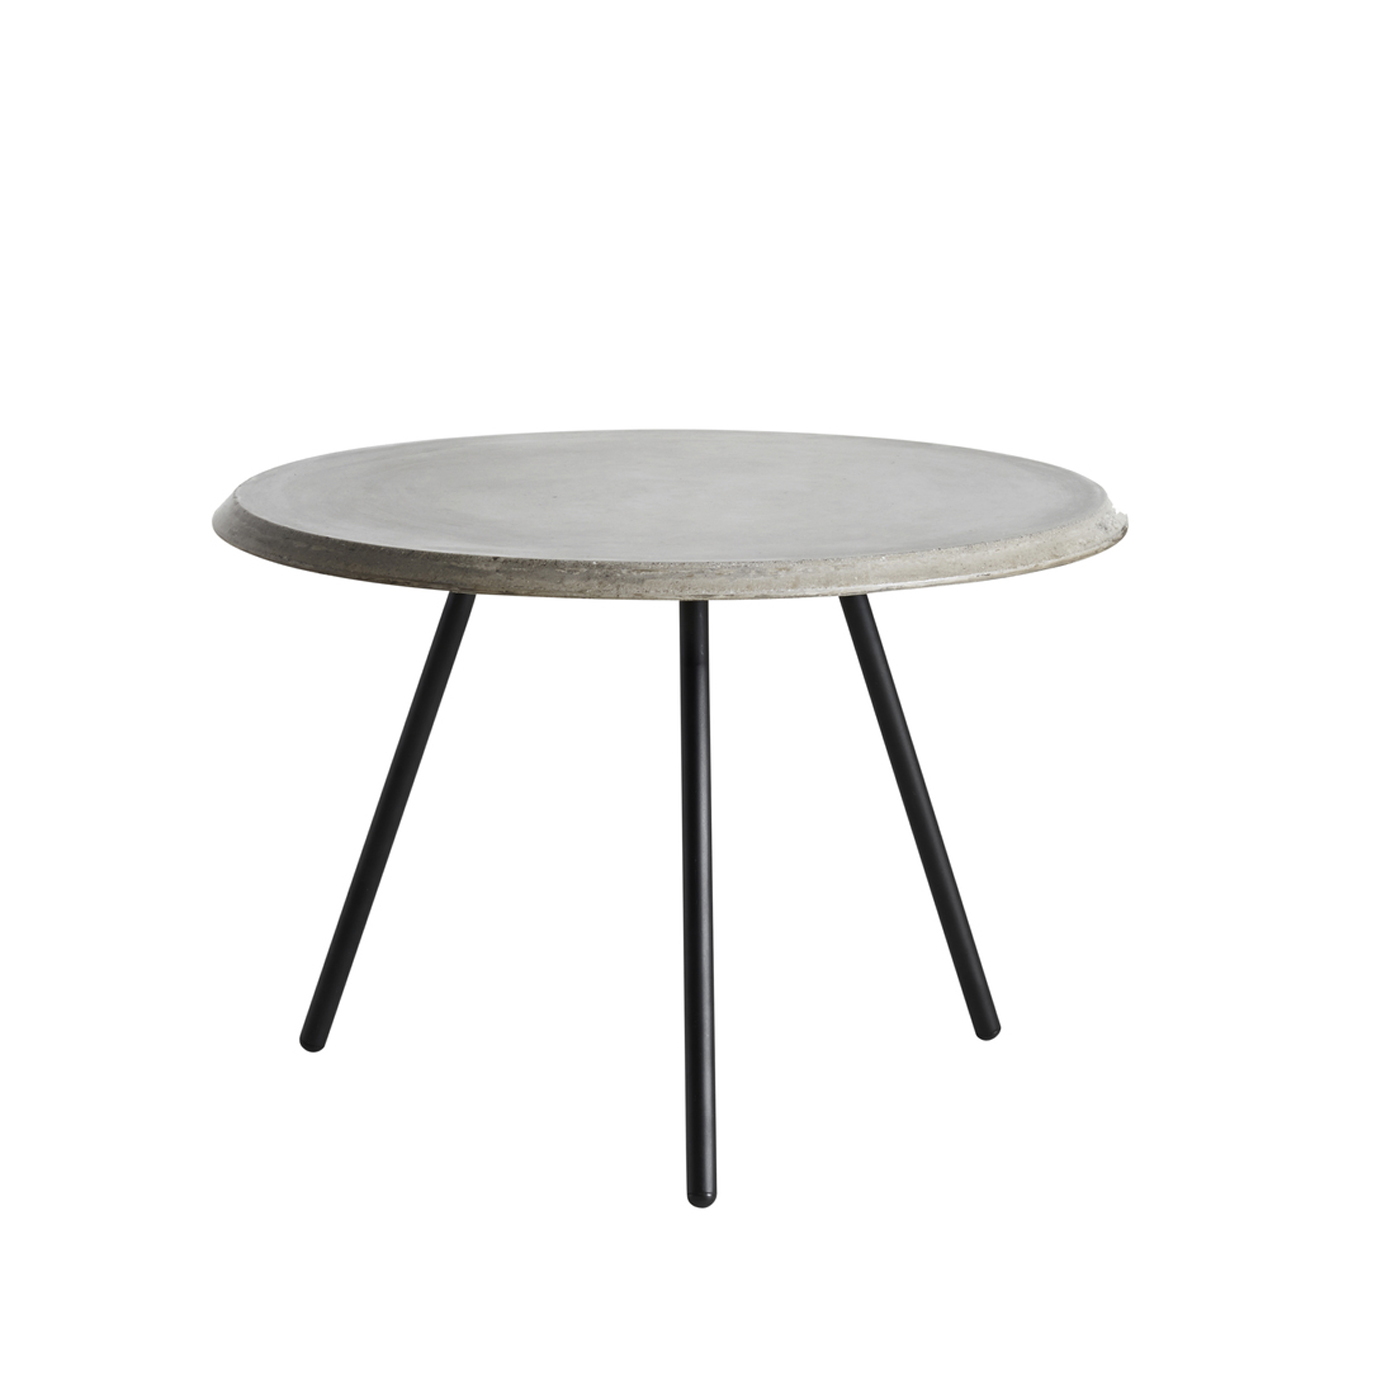 WOUD Soround lav sofabord - grå/sort fiberbeton/metal, rund (Ø60)